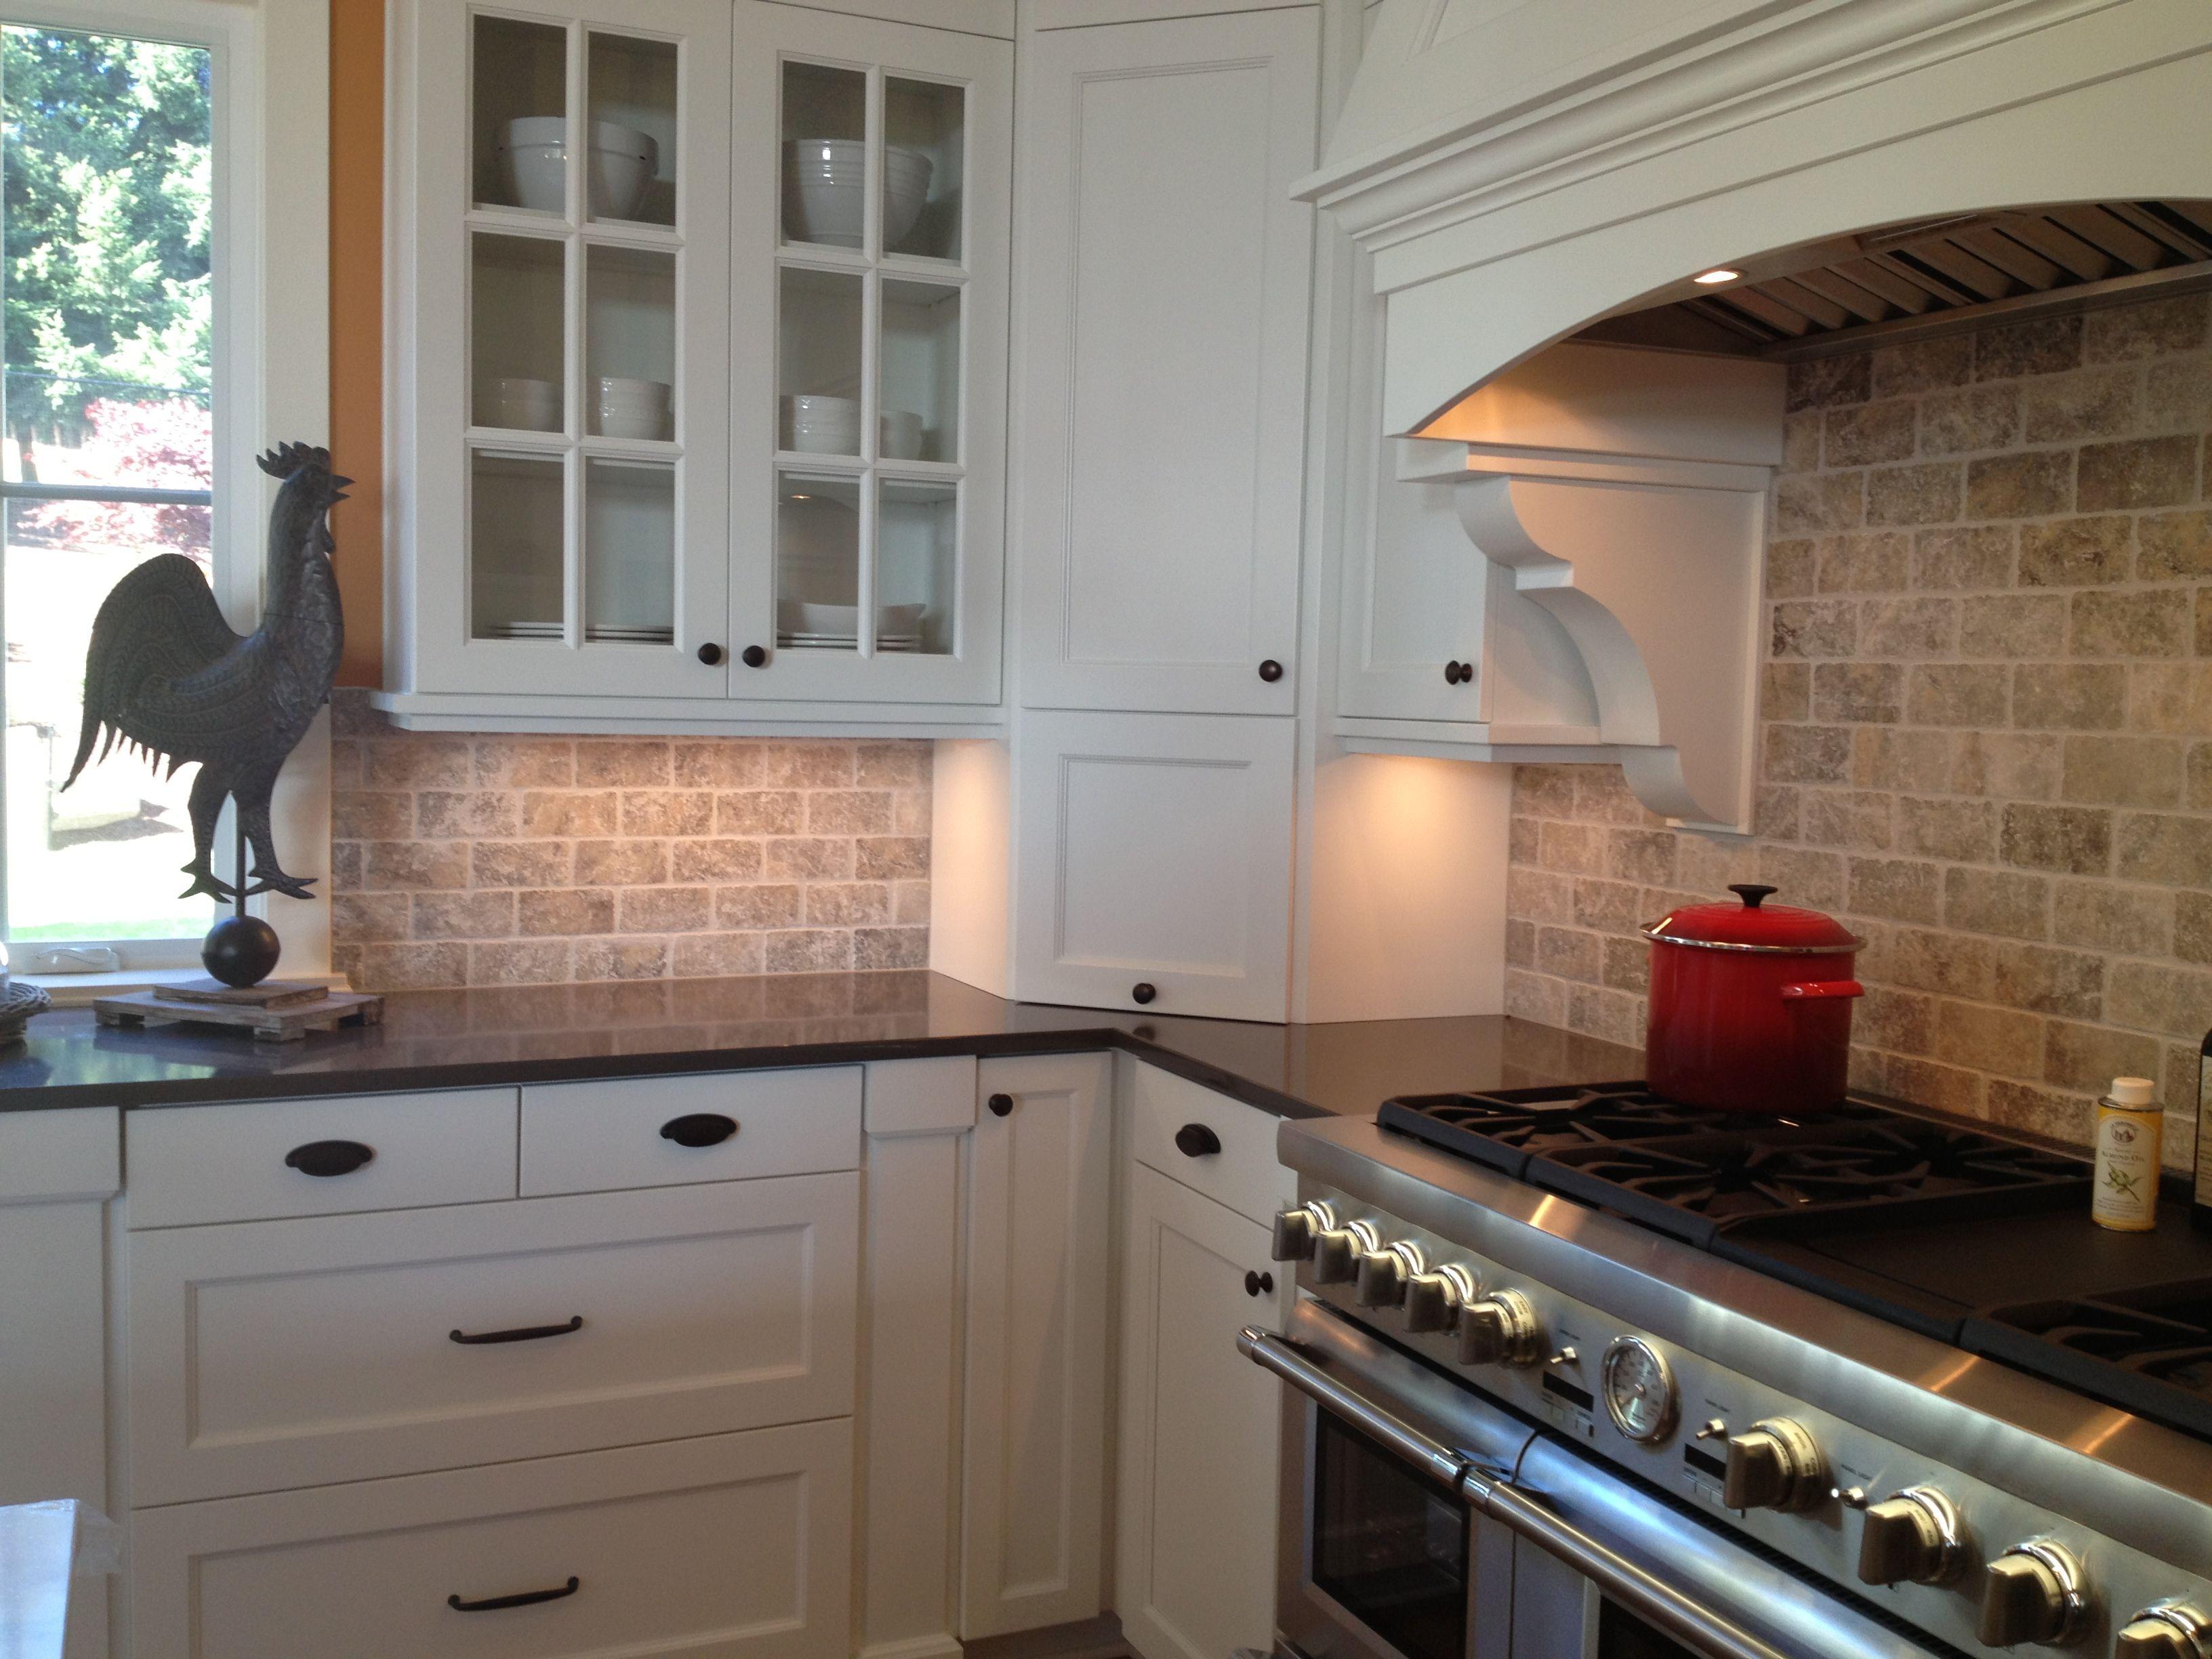 Picture of Kitchen Travertine Backsplash with White ... on Kitchen Backsplash Black Countertop  id=47387